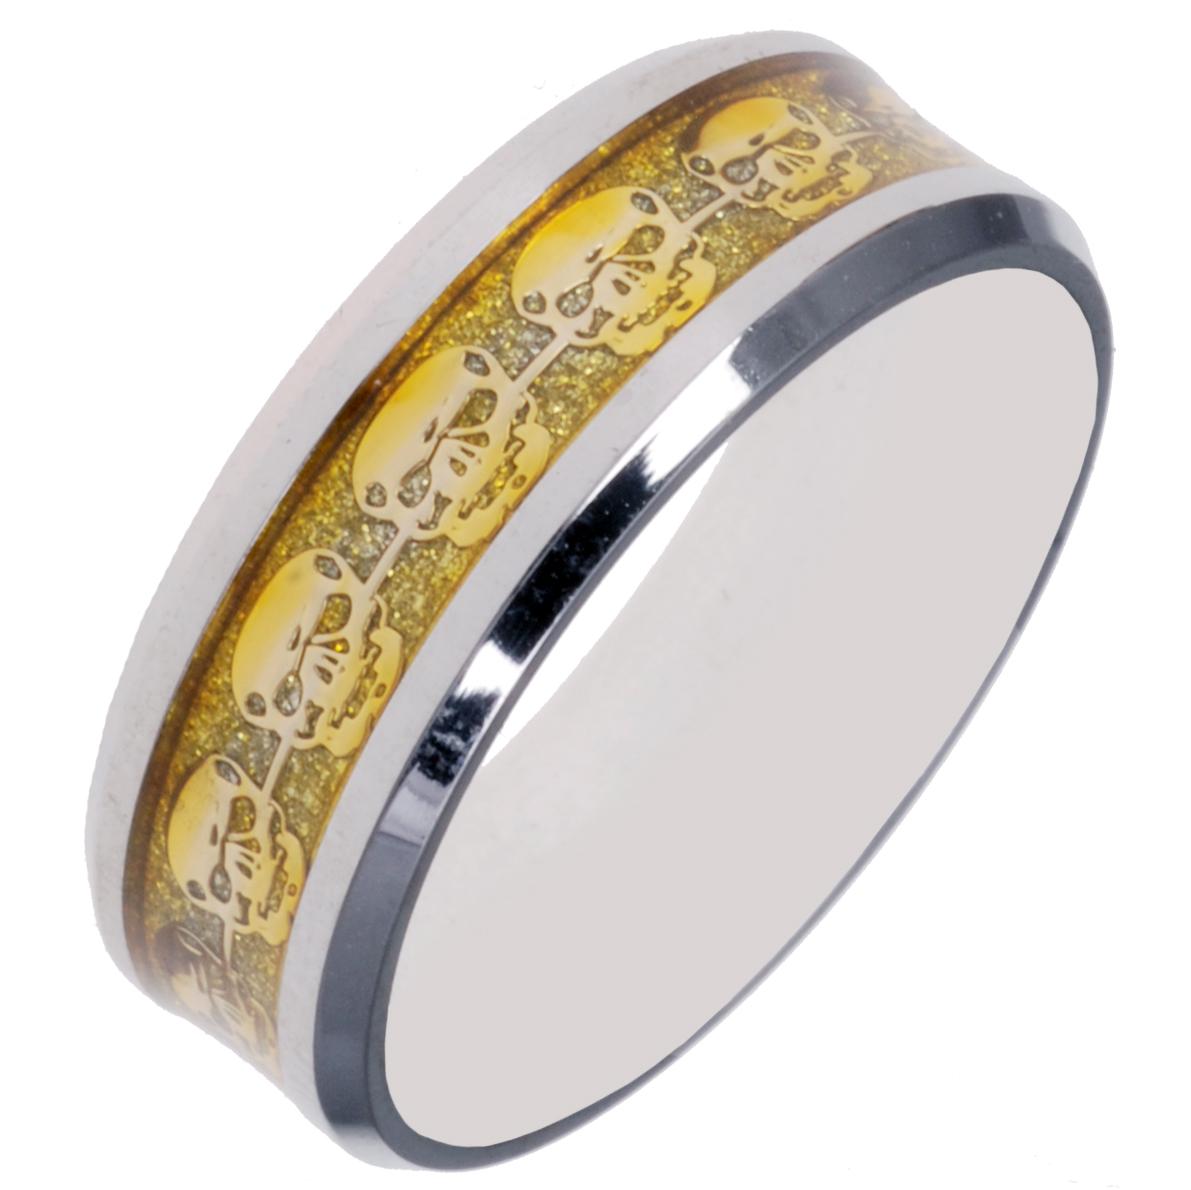 RVS schedel ring Zilver Goud 21.5mm